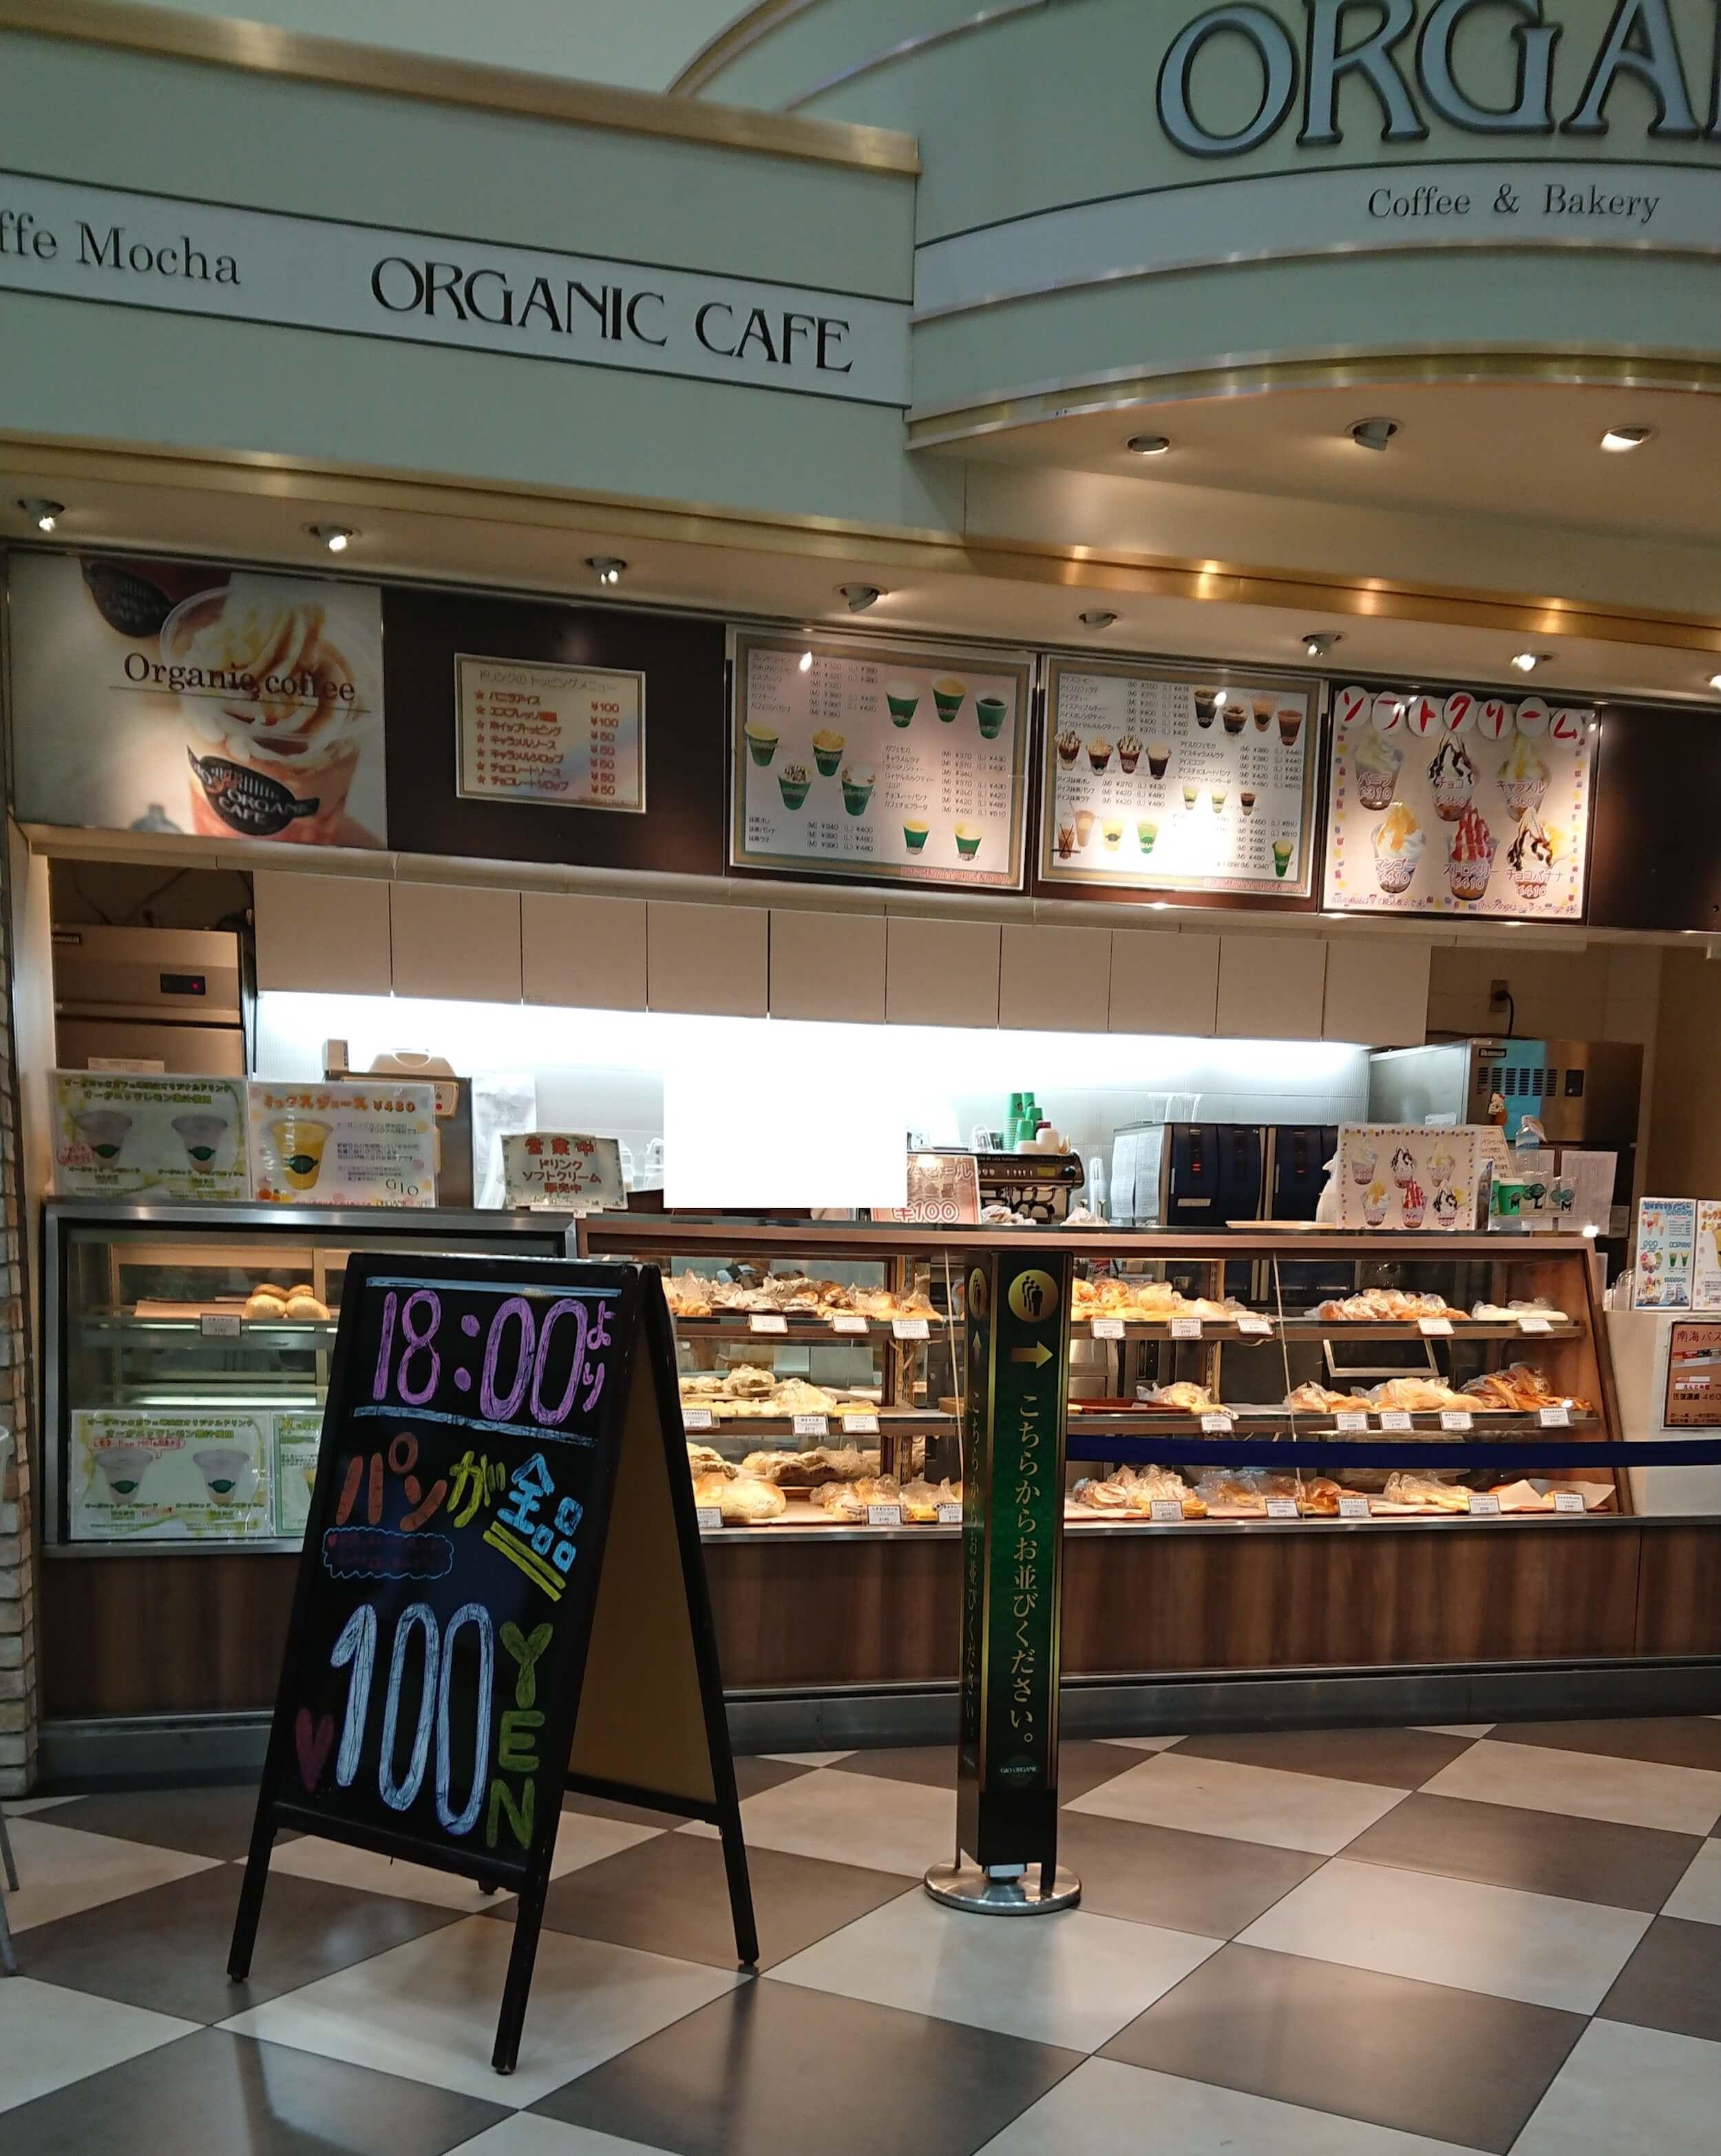 Organiccafe